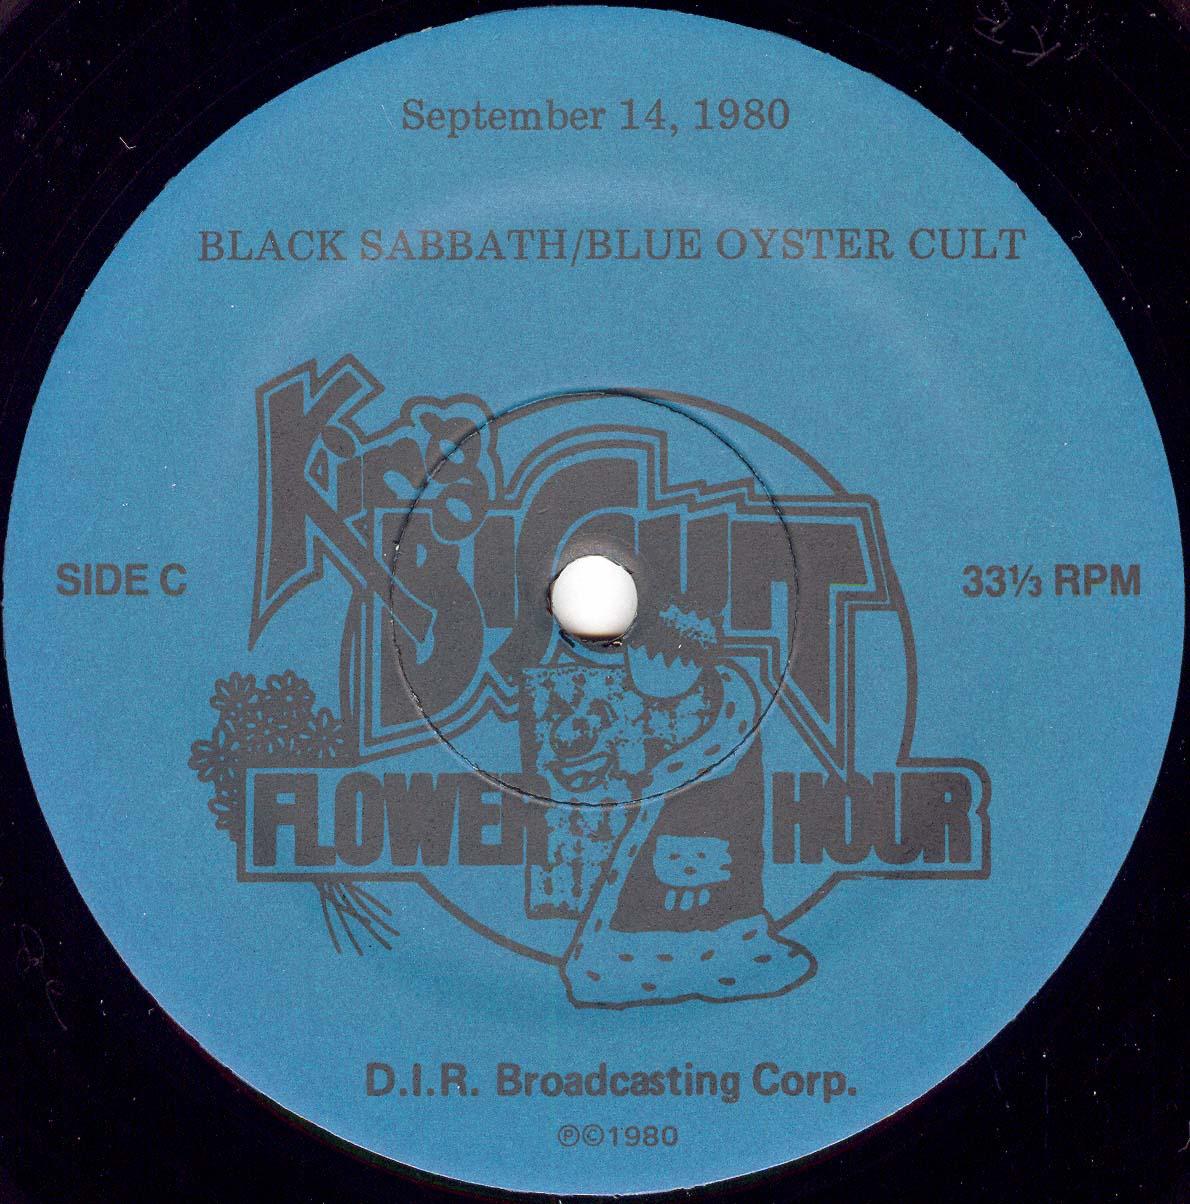 Tapio s Ronnie James Dio Pages Black Sabbath Radioshow LP